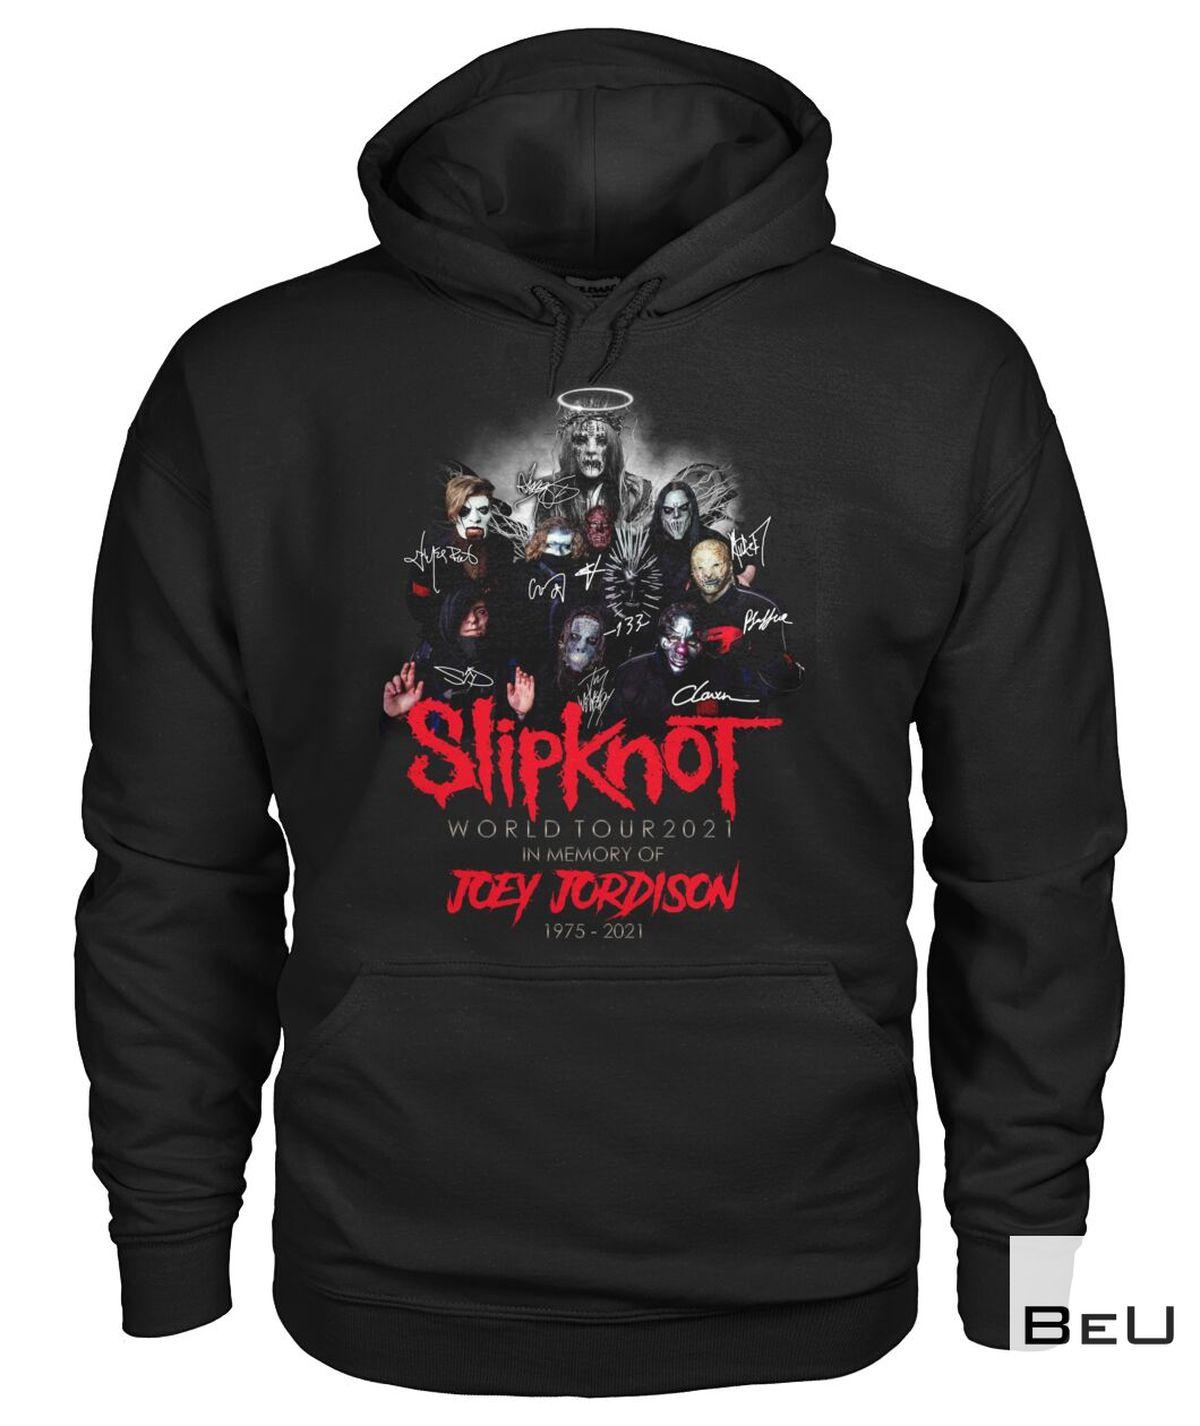 Only For Fan Slipknot Joey Jordison World Tour 2021 Shirt, hoodie, tank top